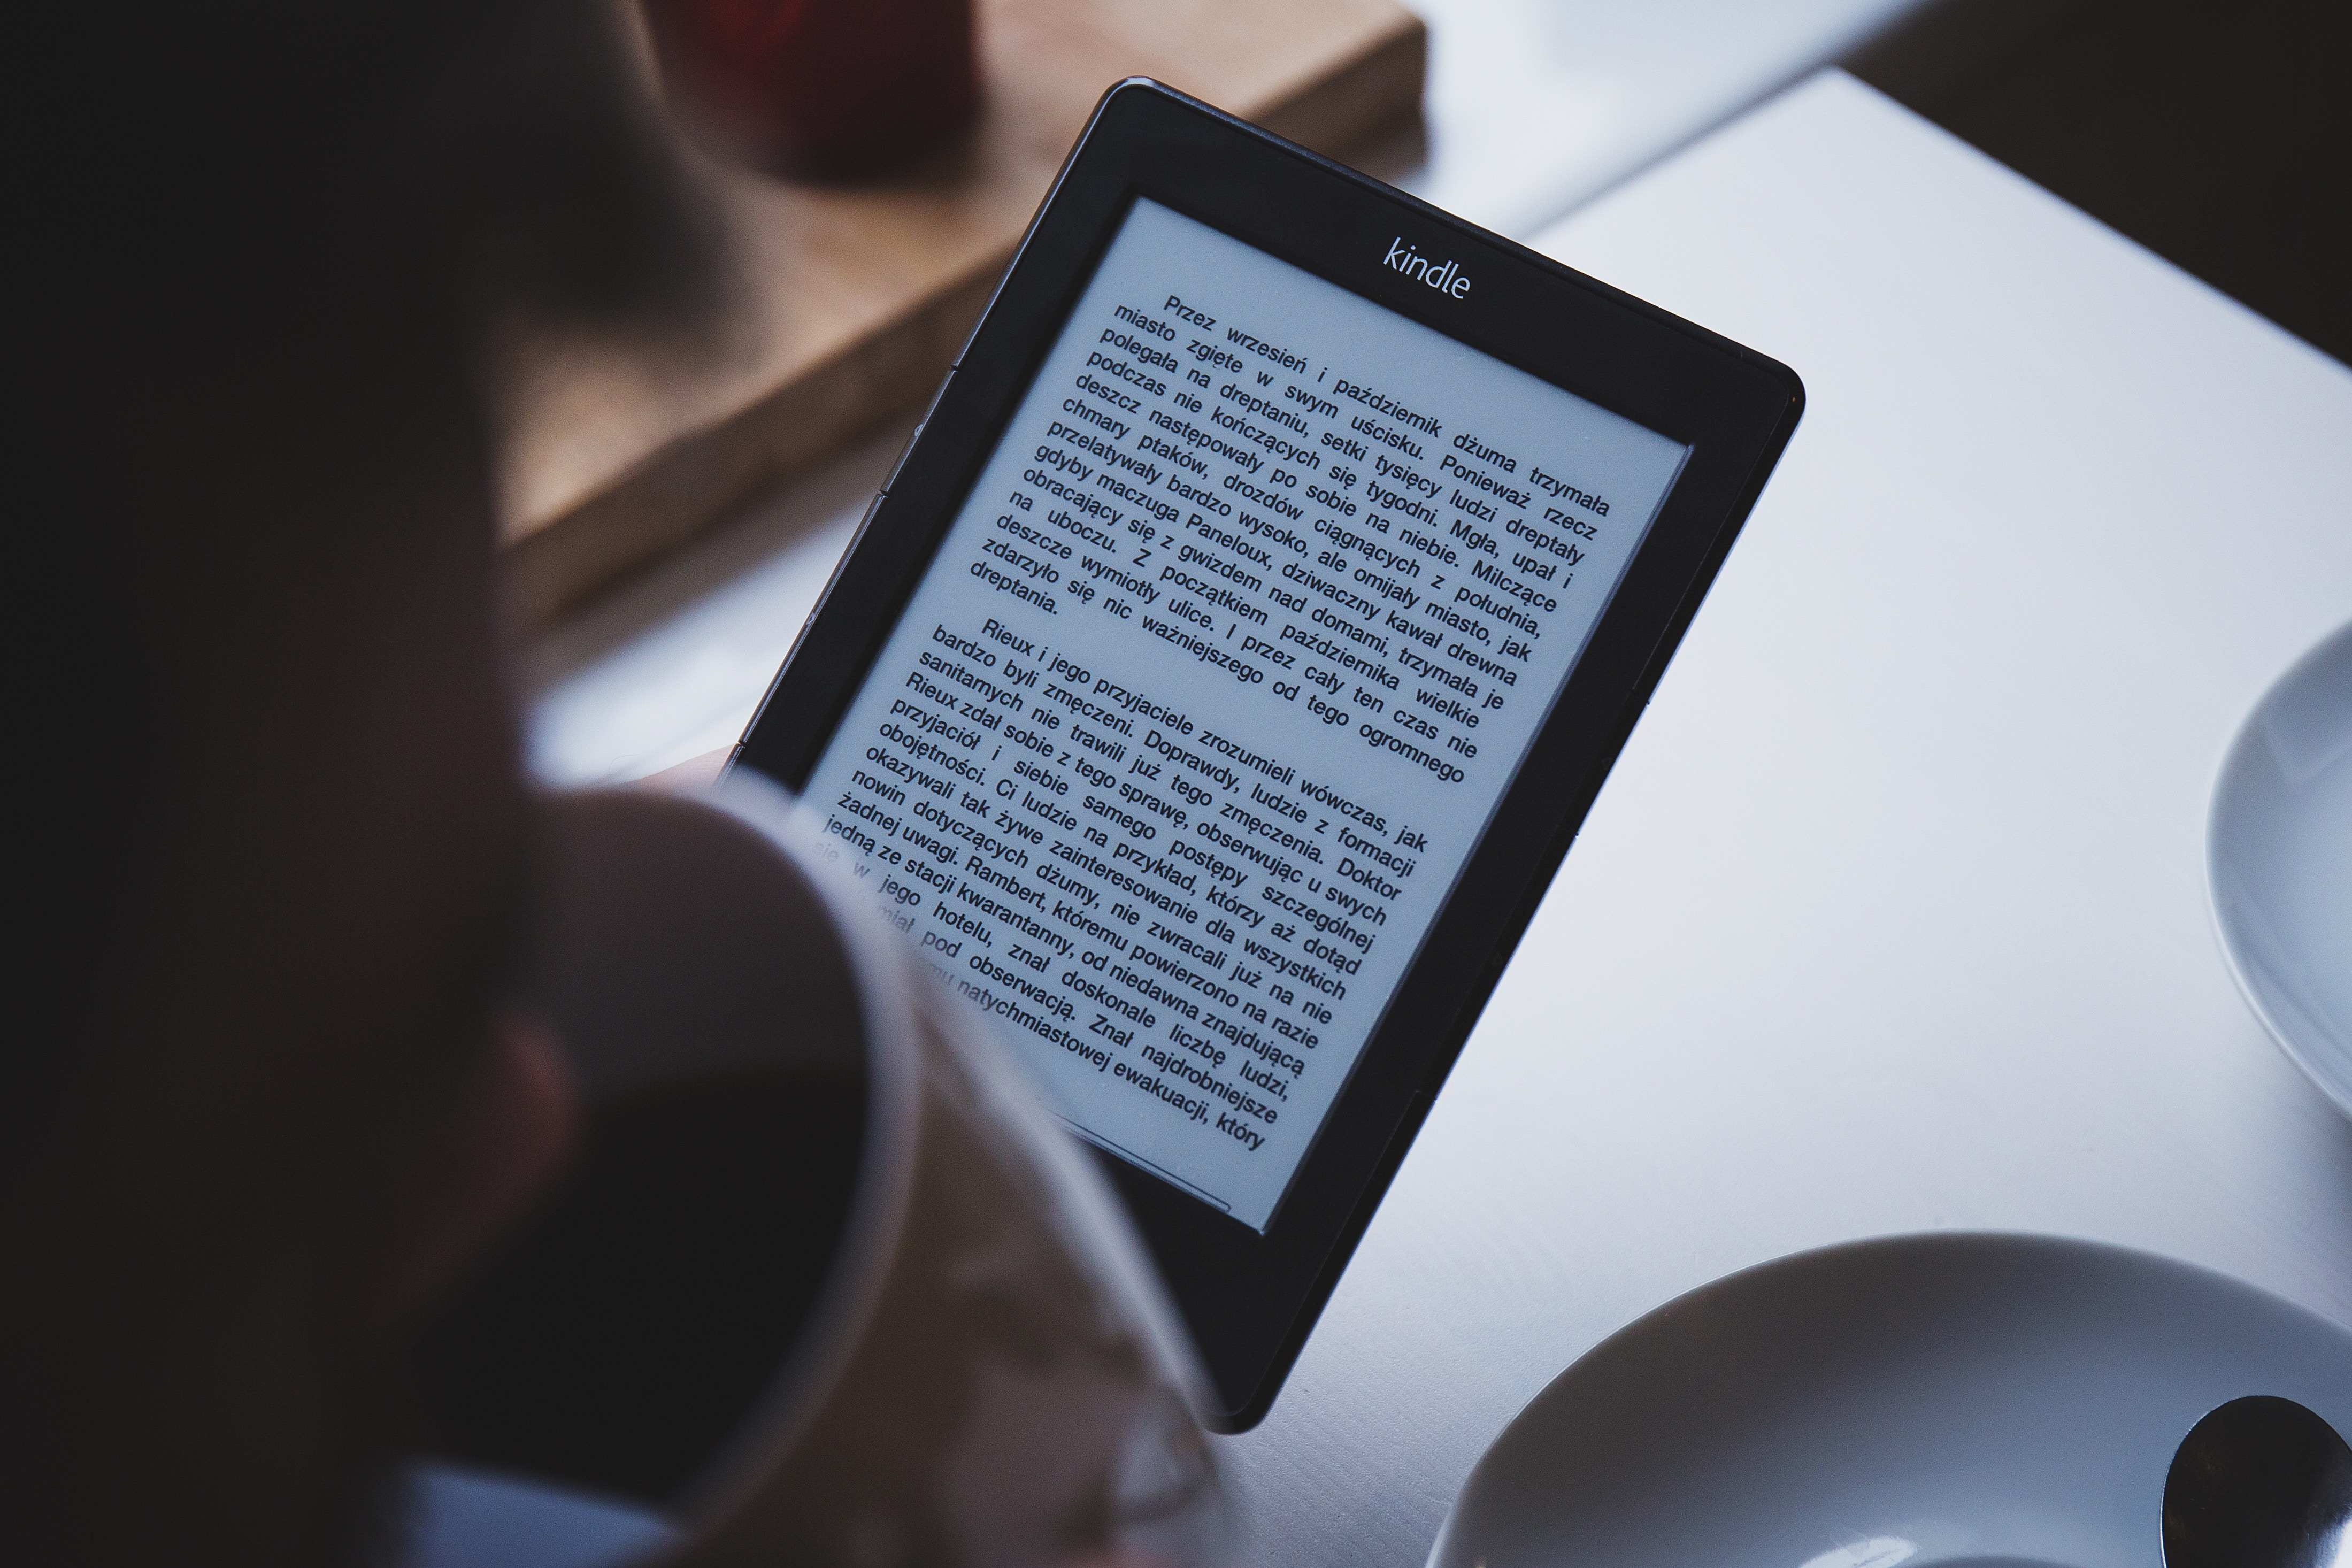 6 Elements of an Effective Ebook